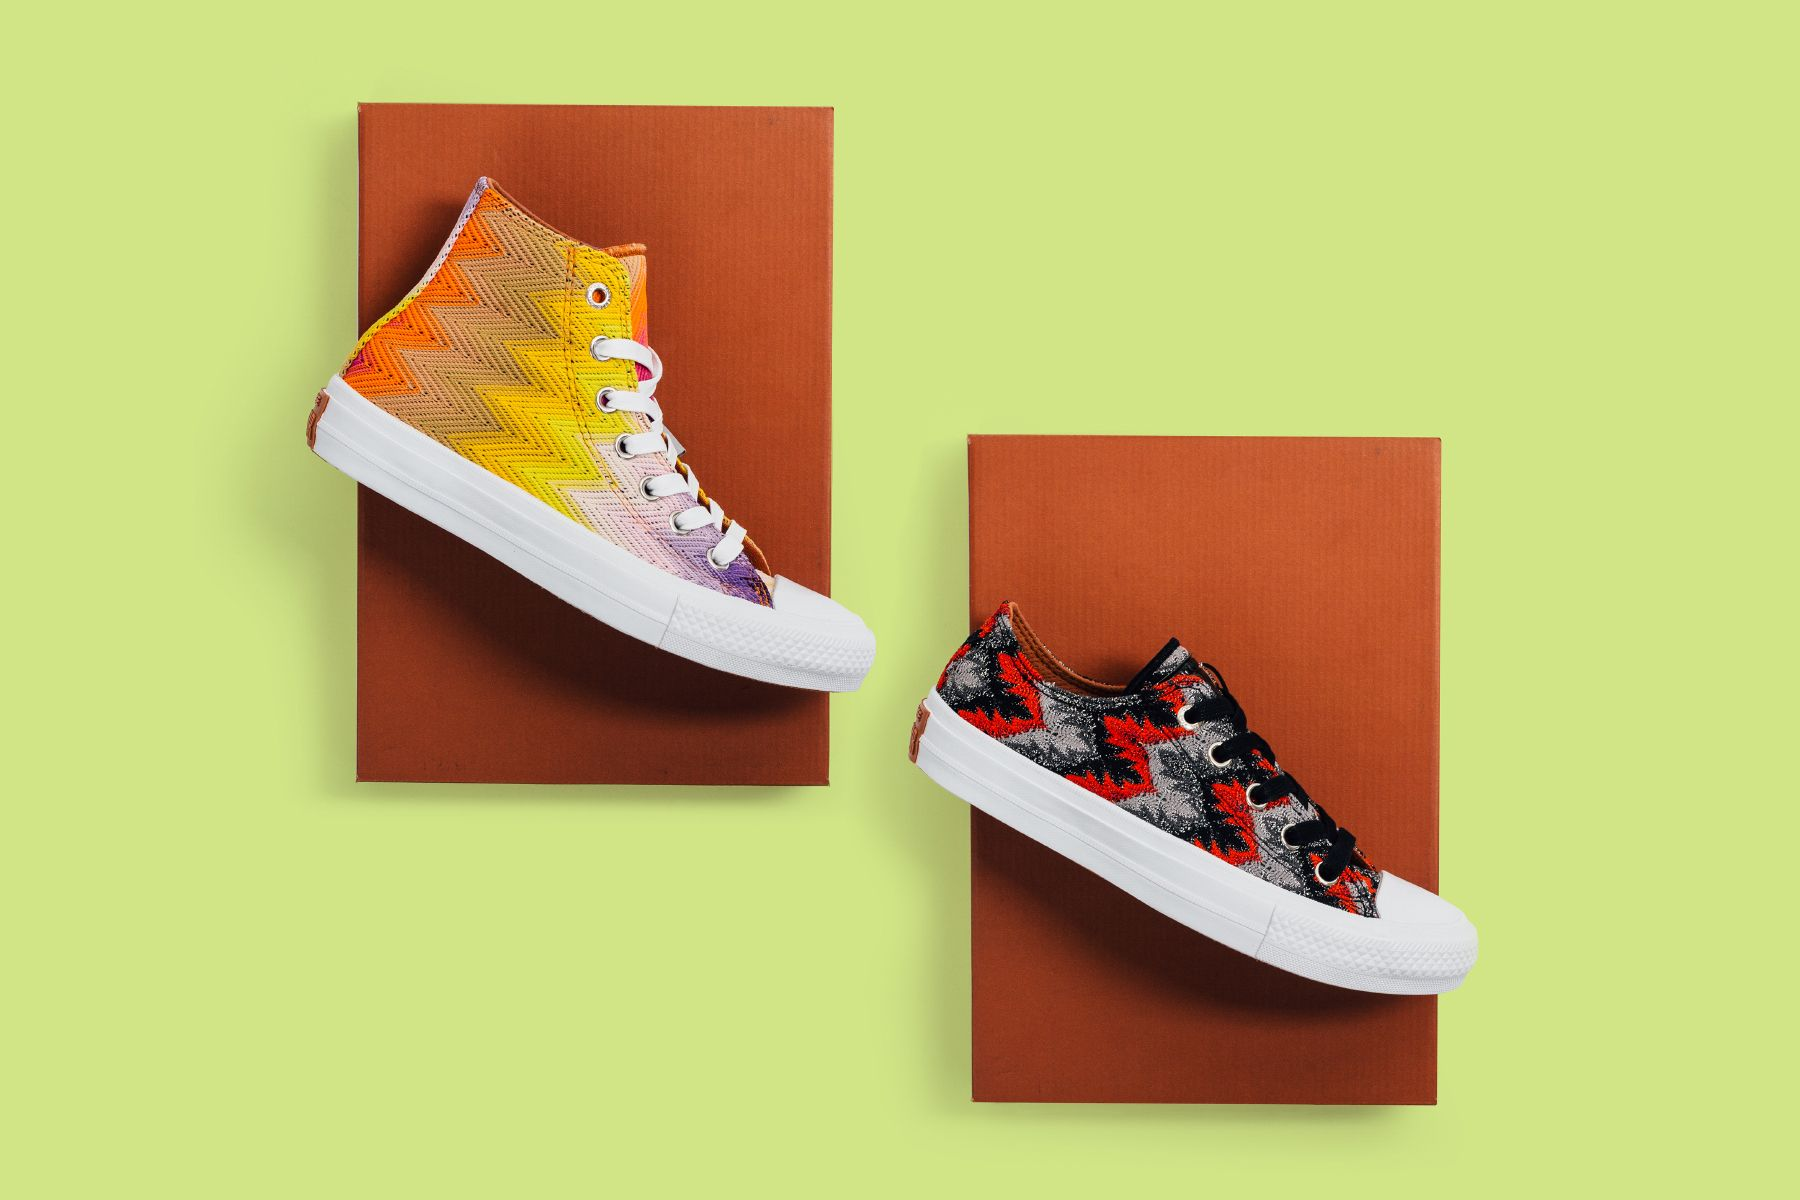 a4a31378c10290 Missoni x Converse Chuck Taylor All-Star II  Hi   Ox Cuts for Summer 2017 -  EU Kicks  Sneaker Magazine